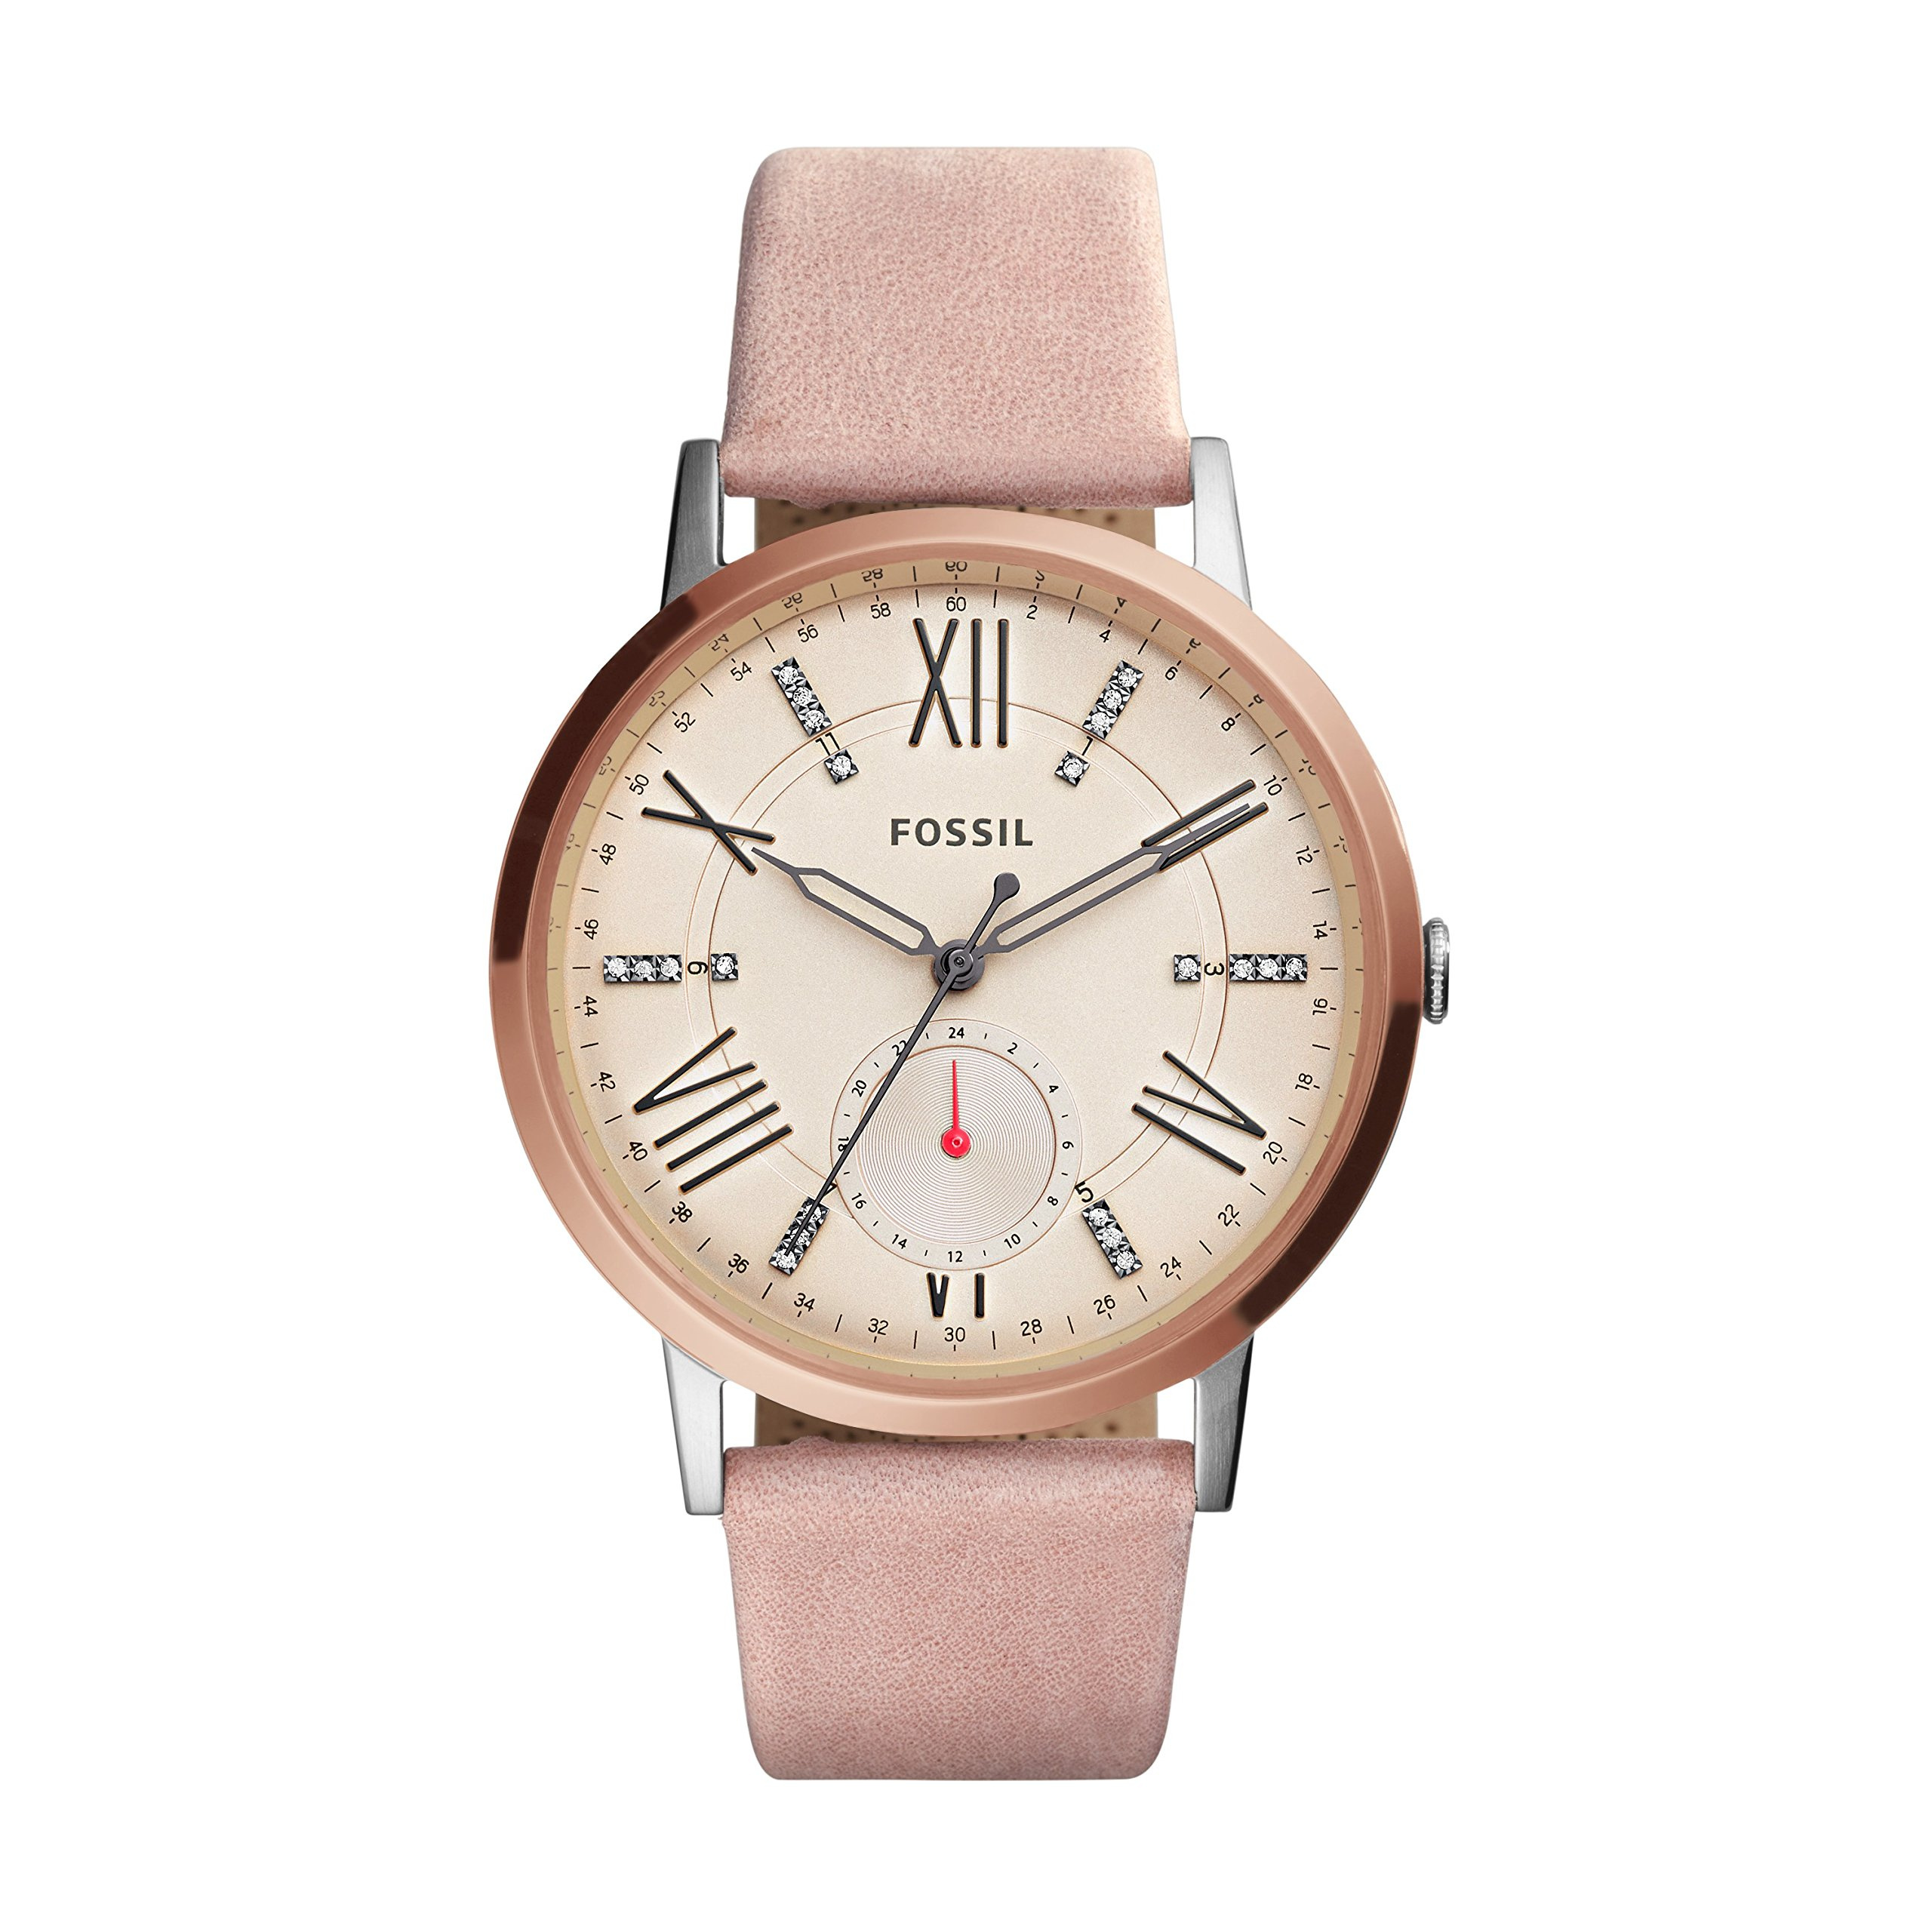 Fossil Women's ES4163 Gazer Multifunction Blush Leather Watch